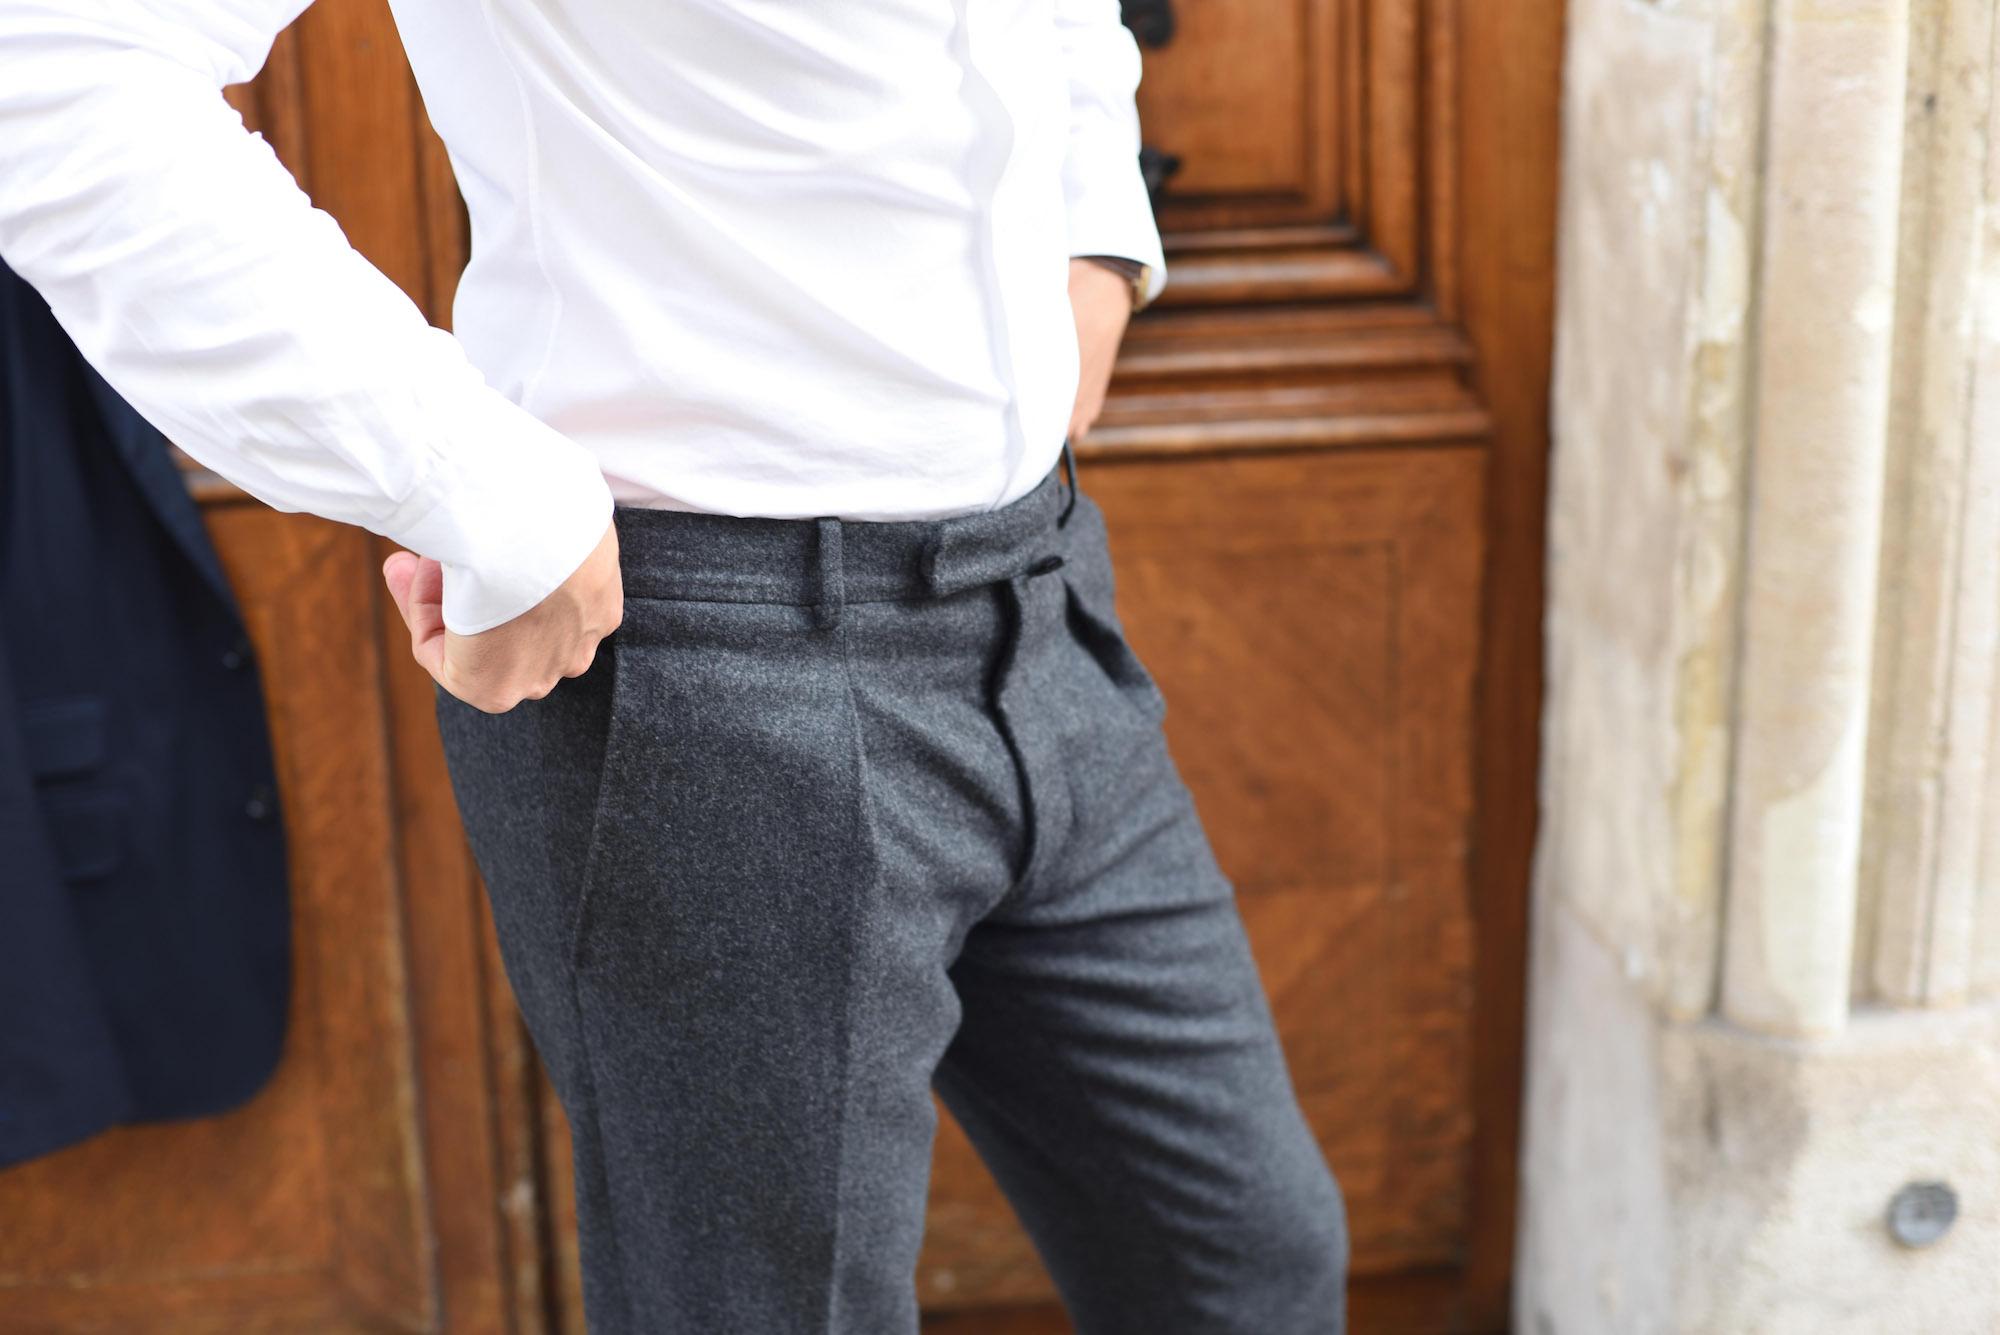 3376f346c469 bernard zins pantalon flanelle blazer bernard zins pantalon flanelle plis  francais ...